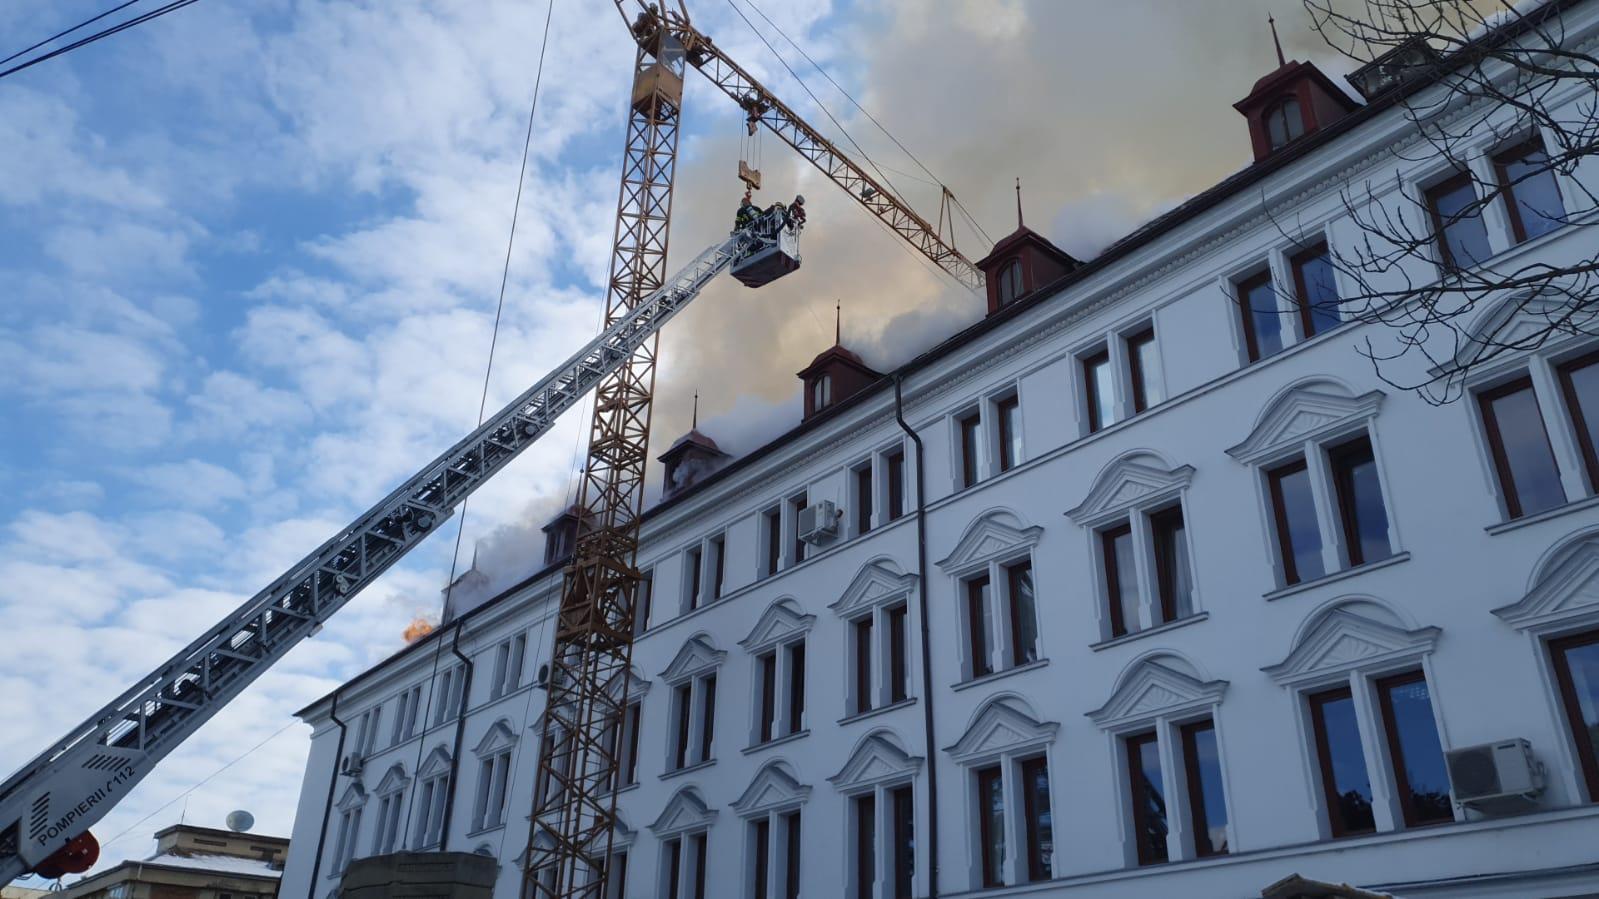 LIVE UPDATE. Incendiu violent la Prefectura din Suceava. Focul s-a extins și a ajuns la etajul III. VIDEO